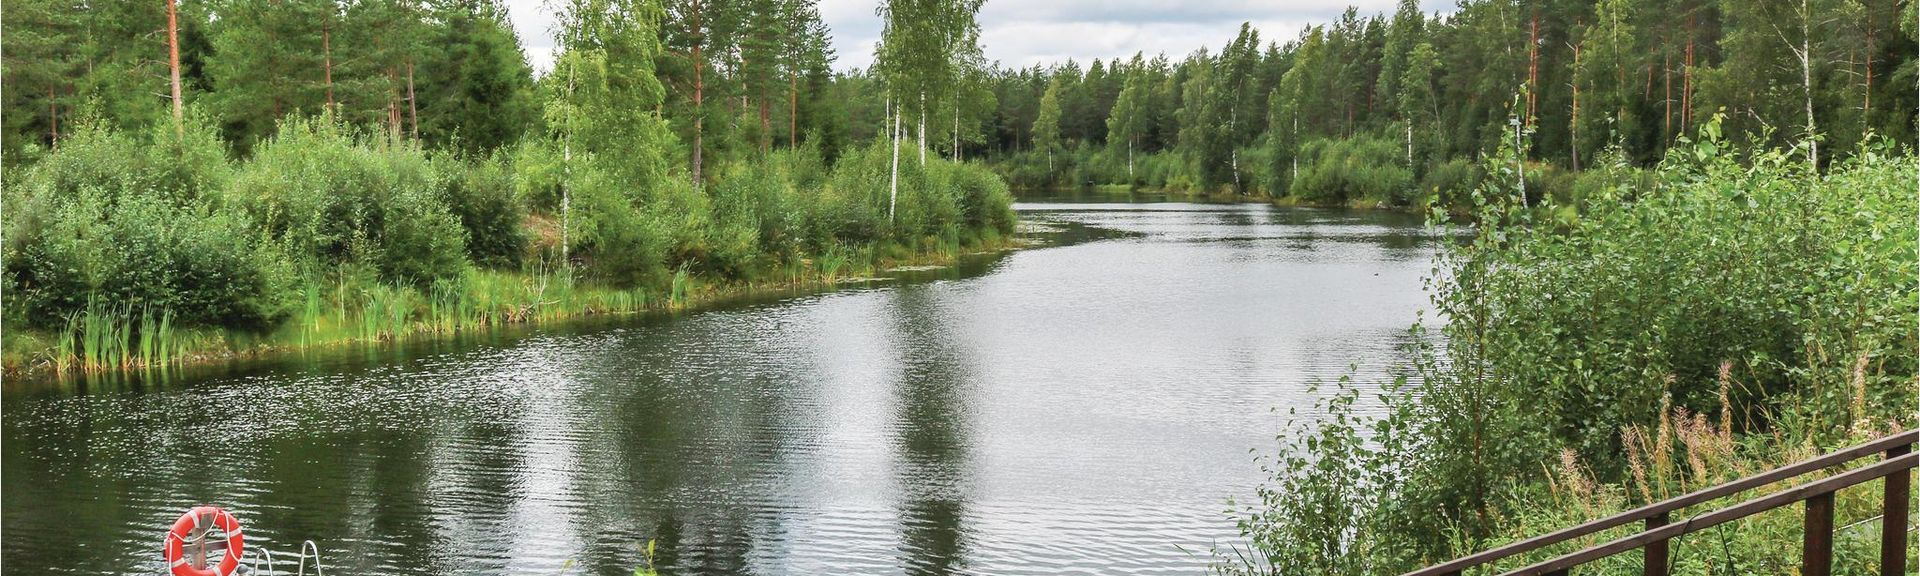 Pori, Satakunta, Finland